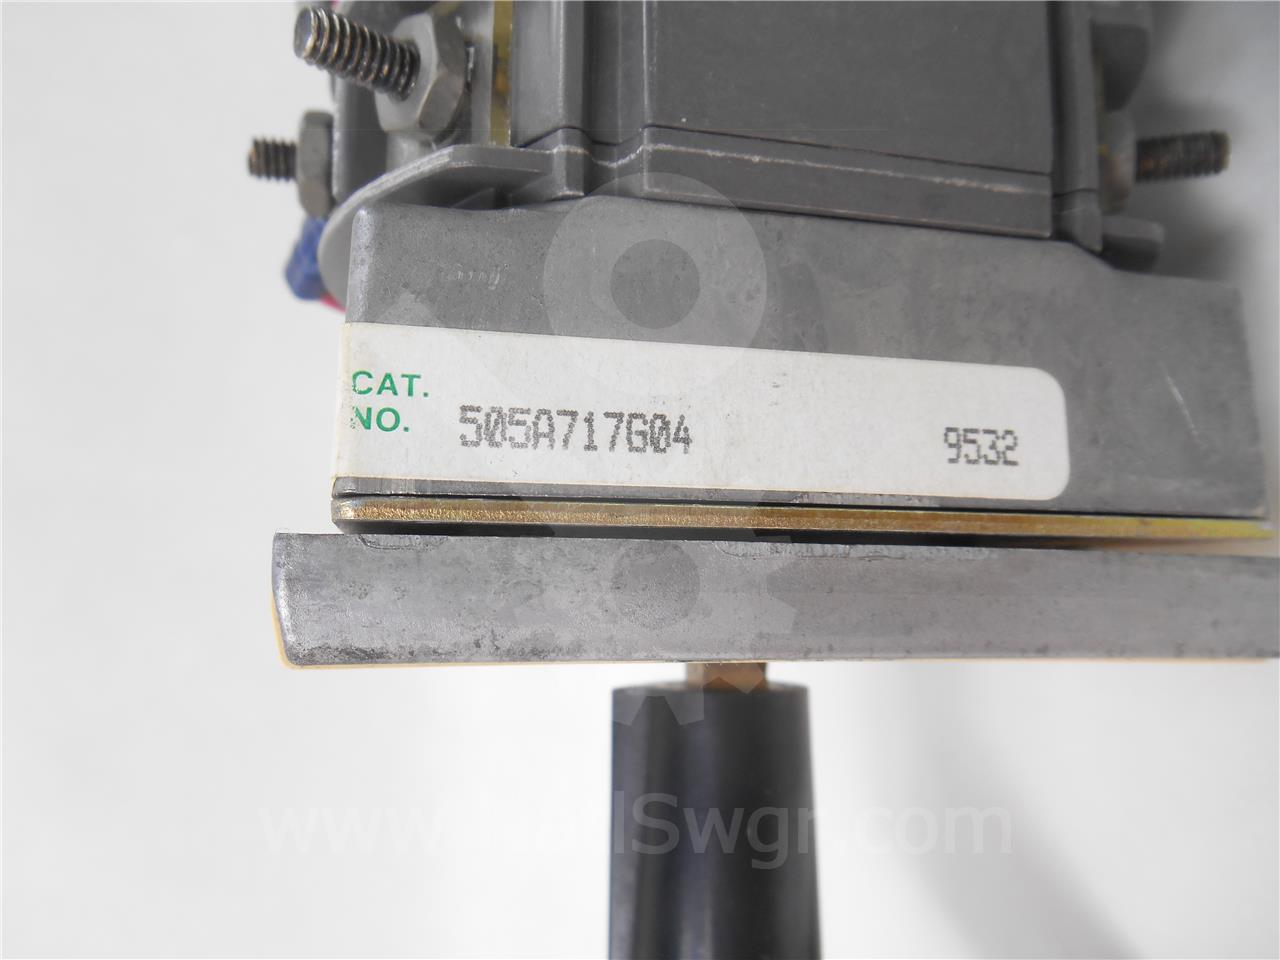 ELECTROSWITCH TYPE W2 CIRCUIT BREAKER CONTROL SWITCH